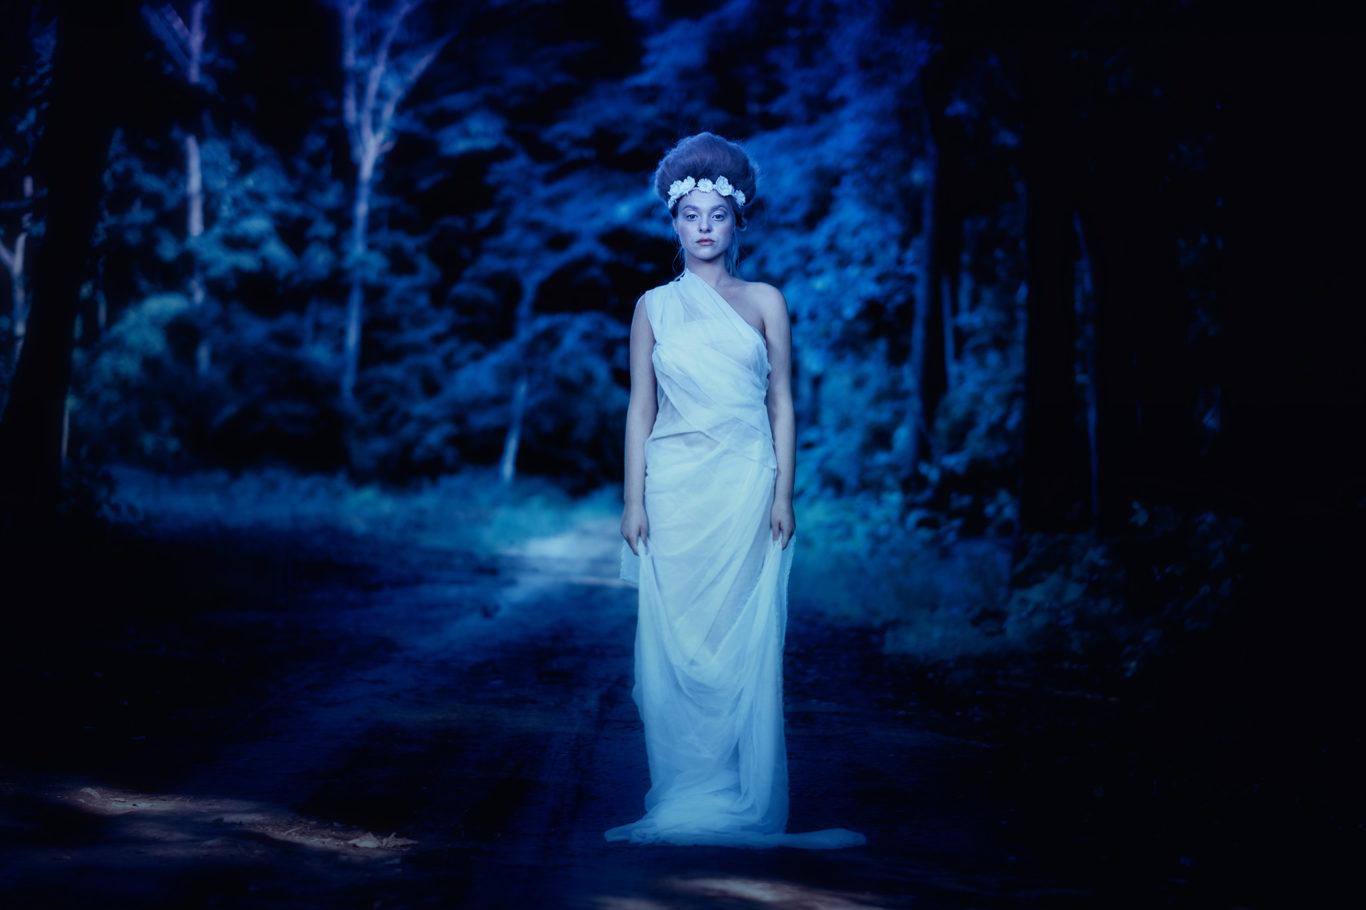 0079-Fotografie-fashion-Frozen-Queen-fotograf-Ciprian-Dumitrescu-DSCF7290